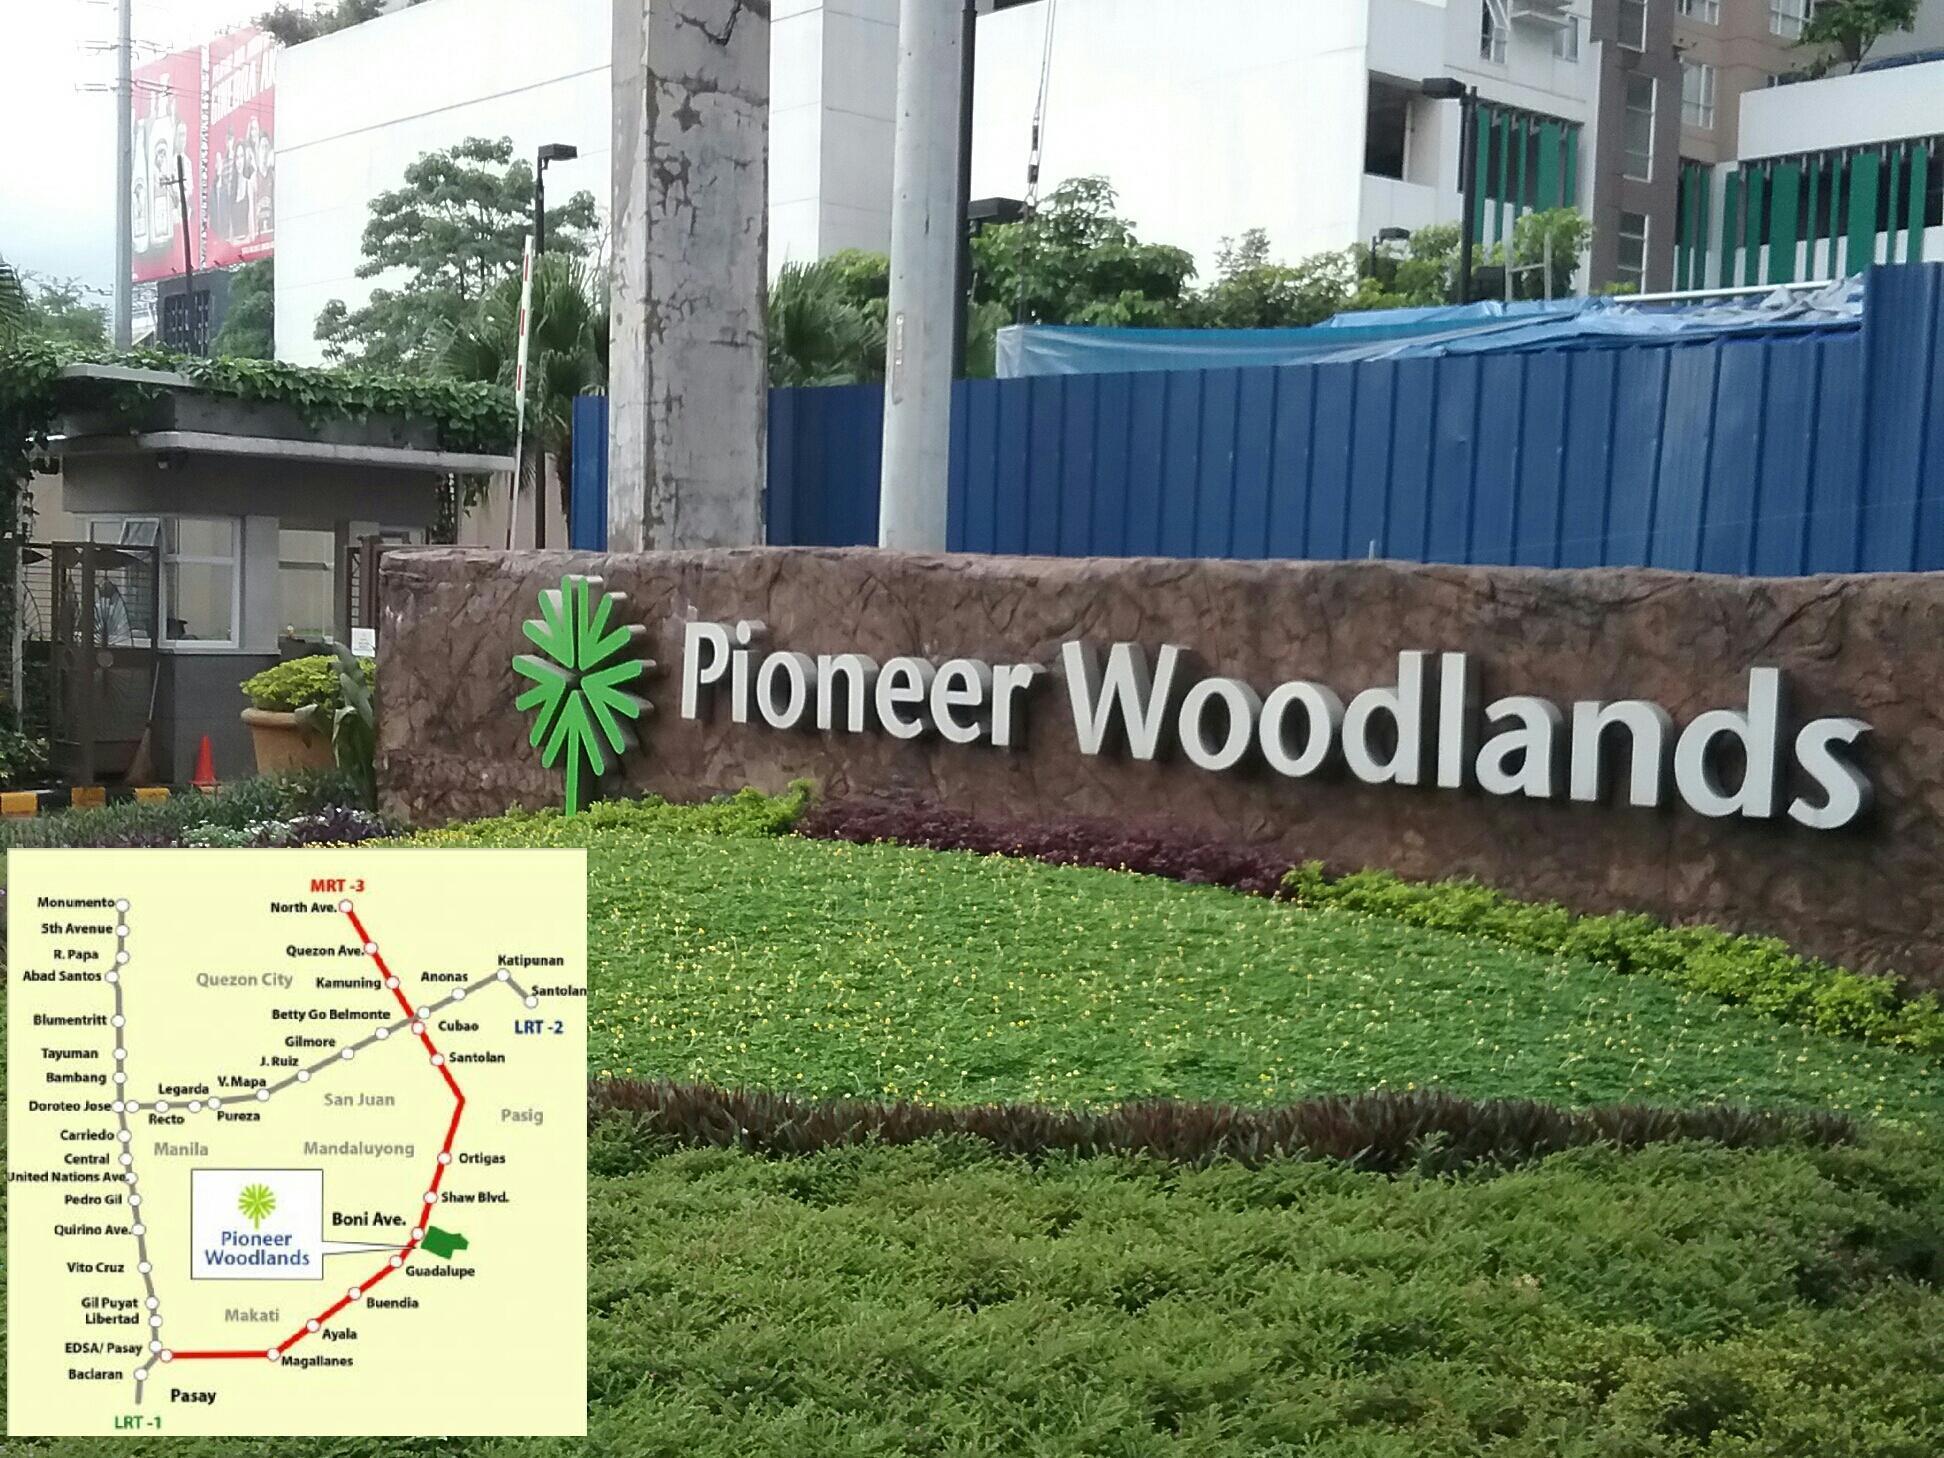 Condoluxe Pioneer Woodlands W Parking